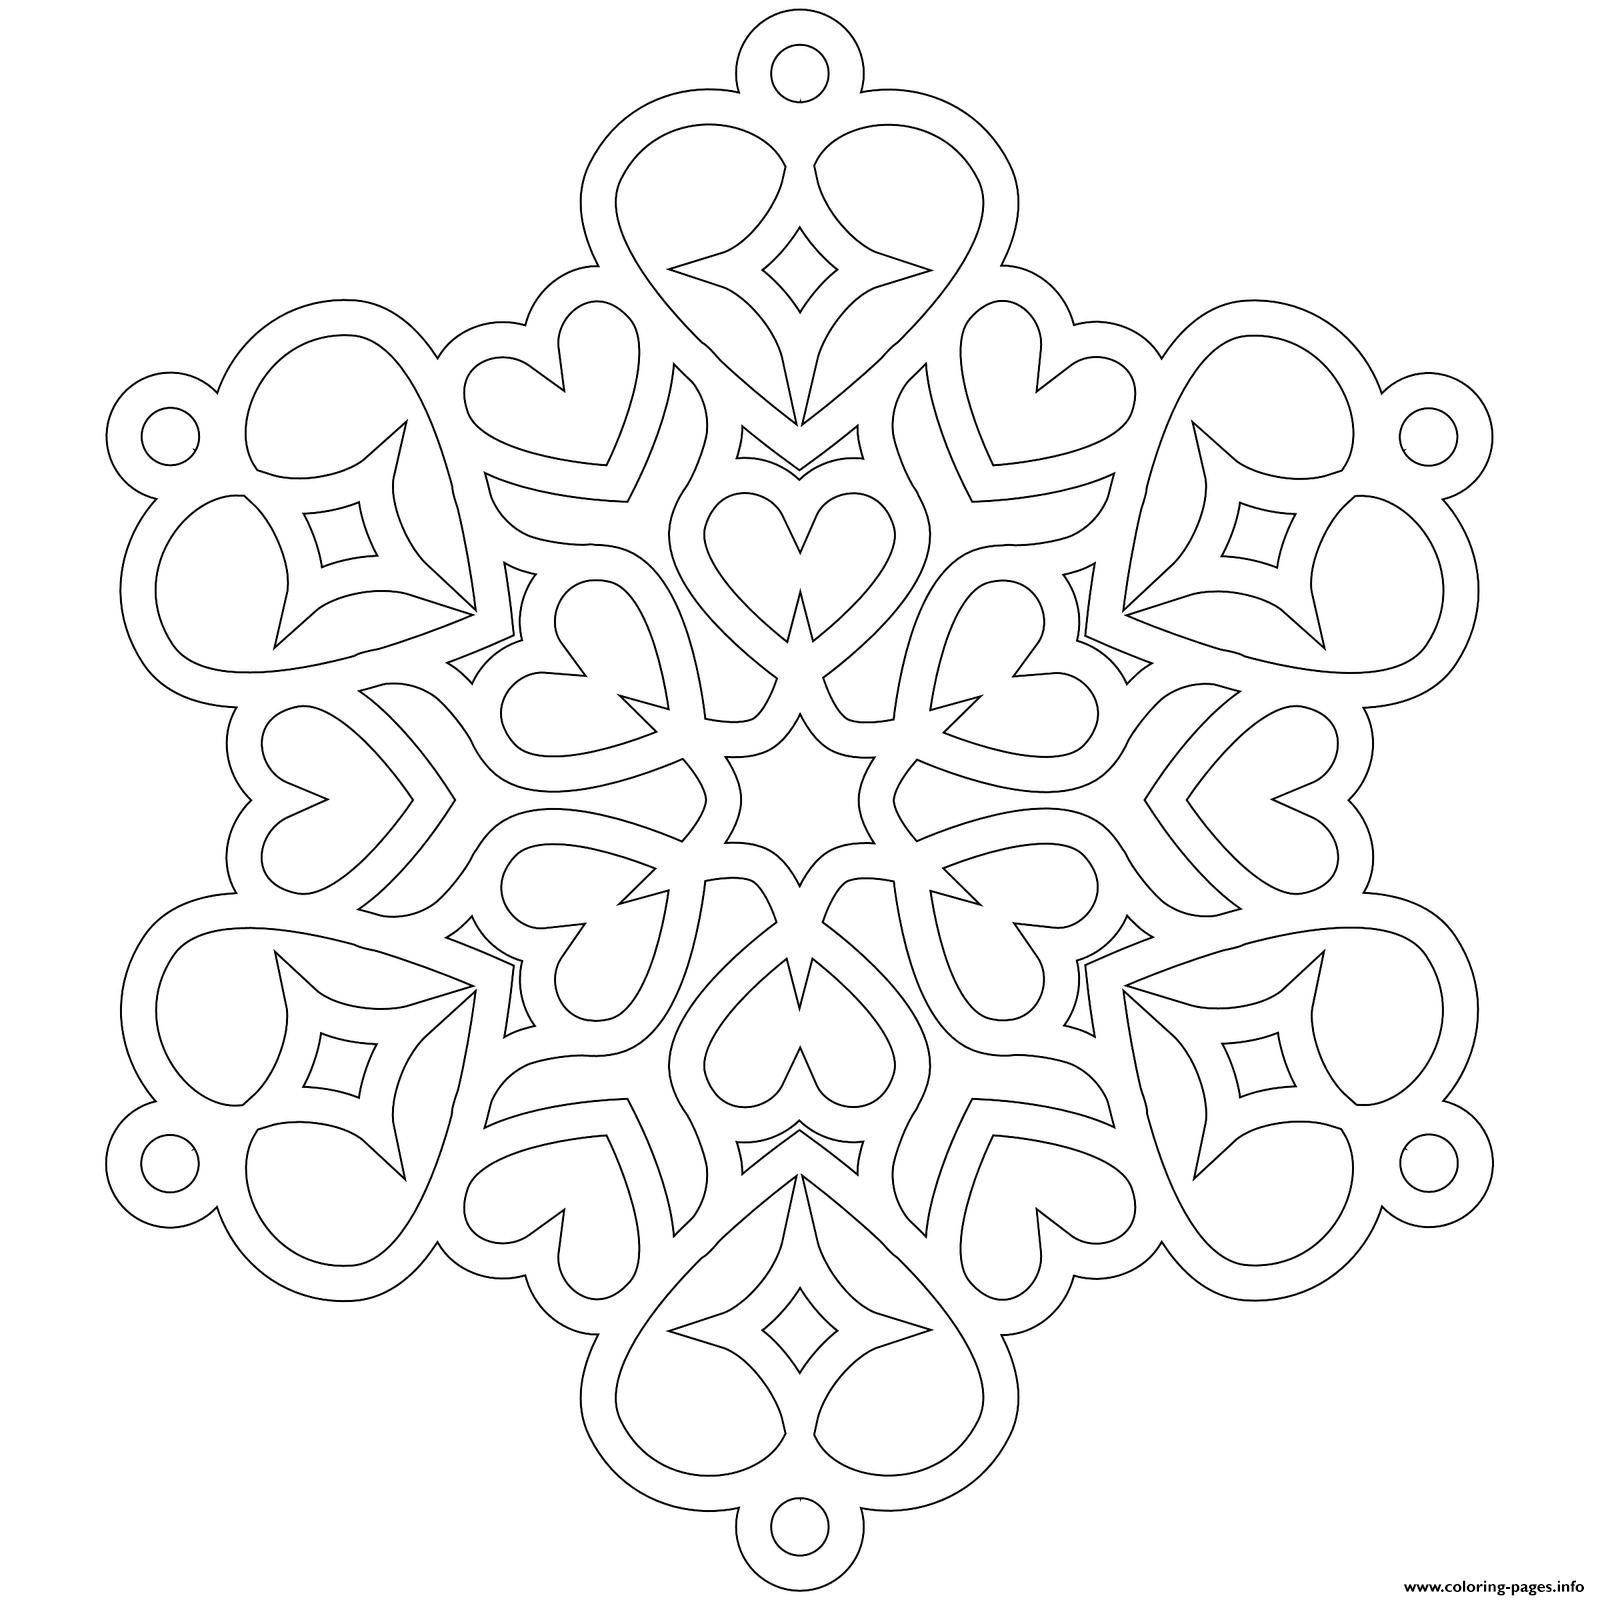 Snowflake Hearts Mandala Coloring